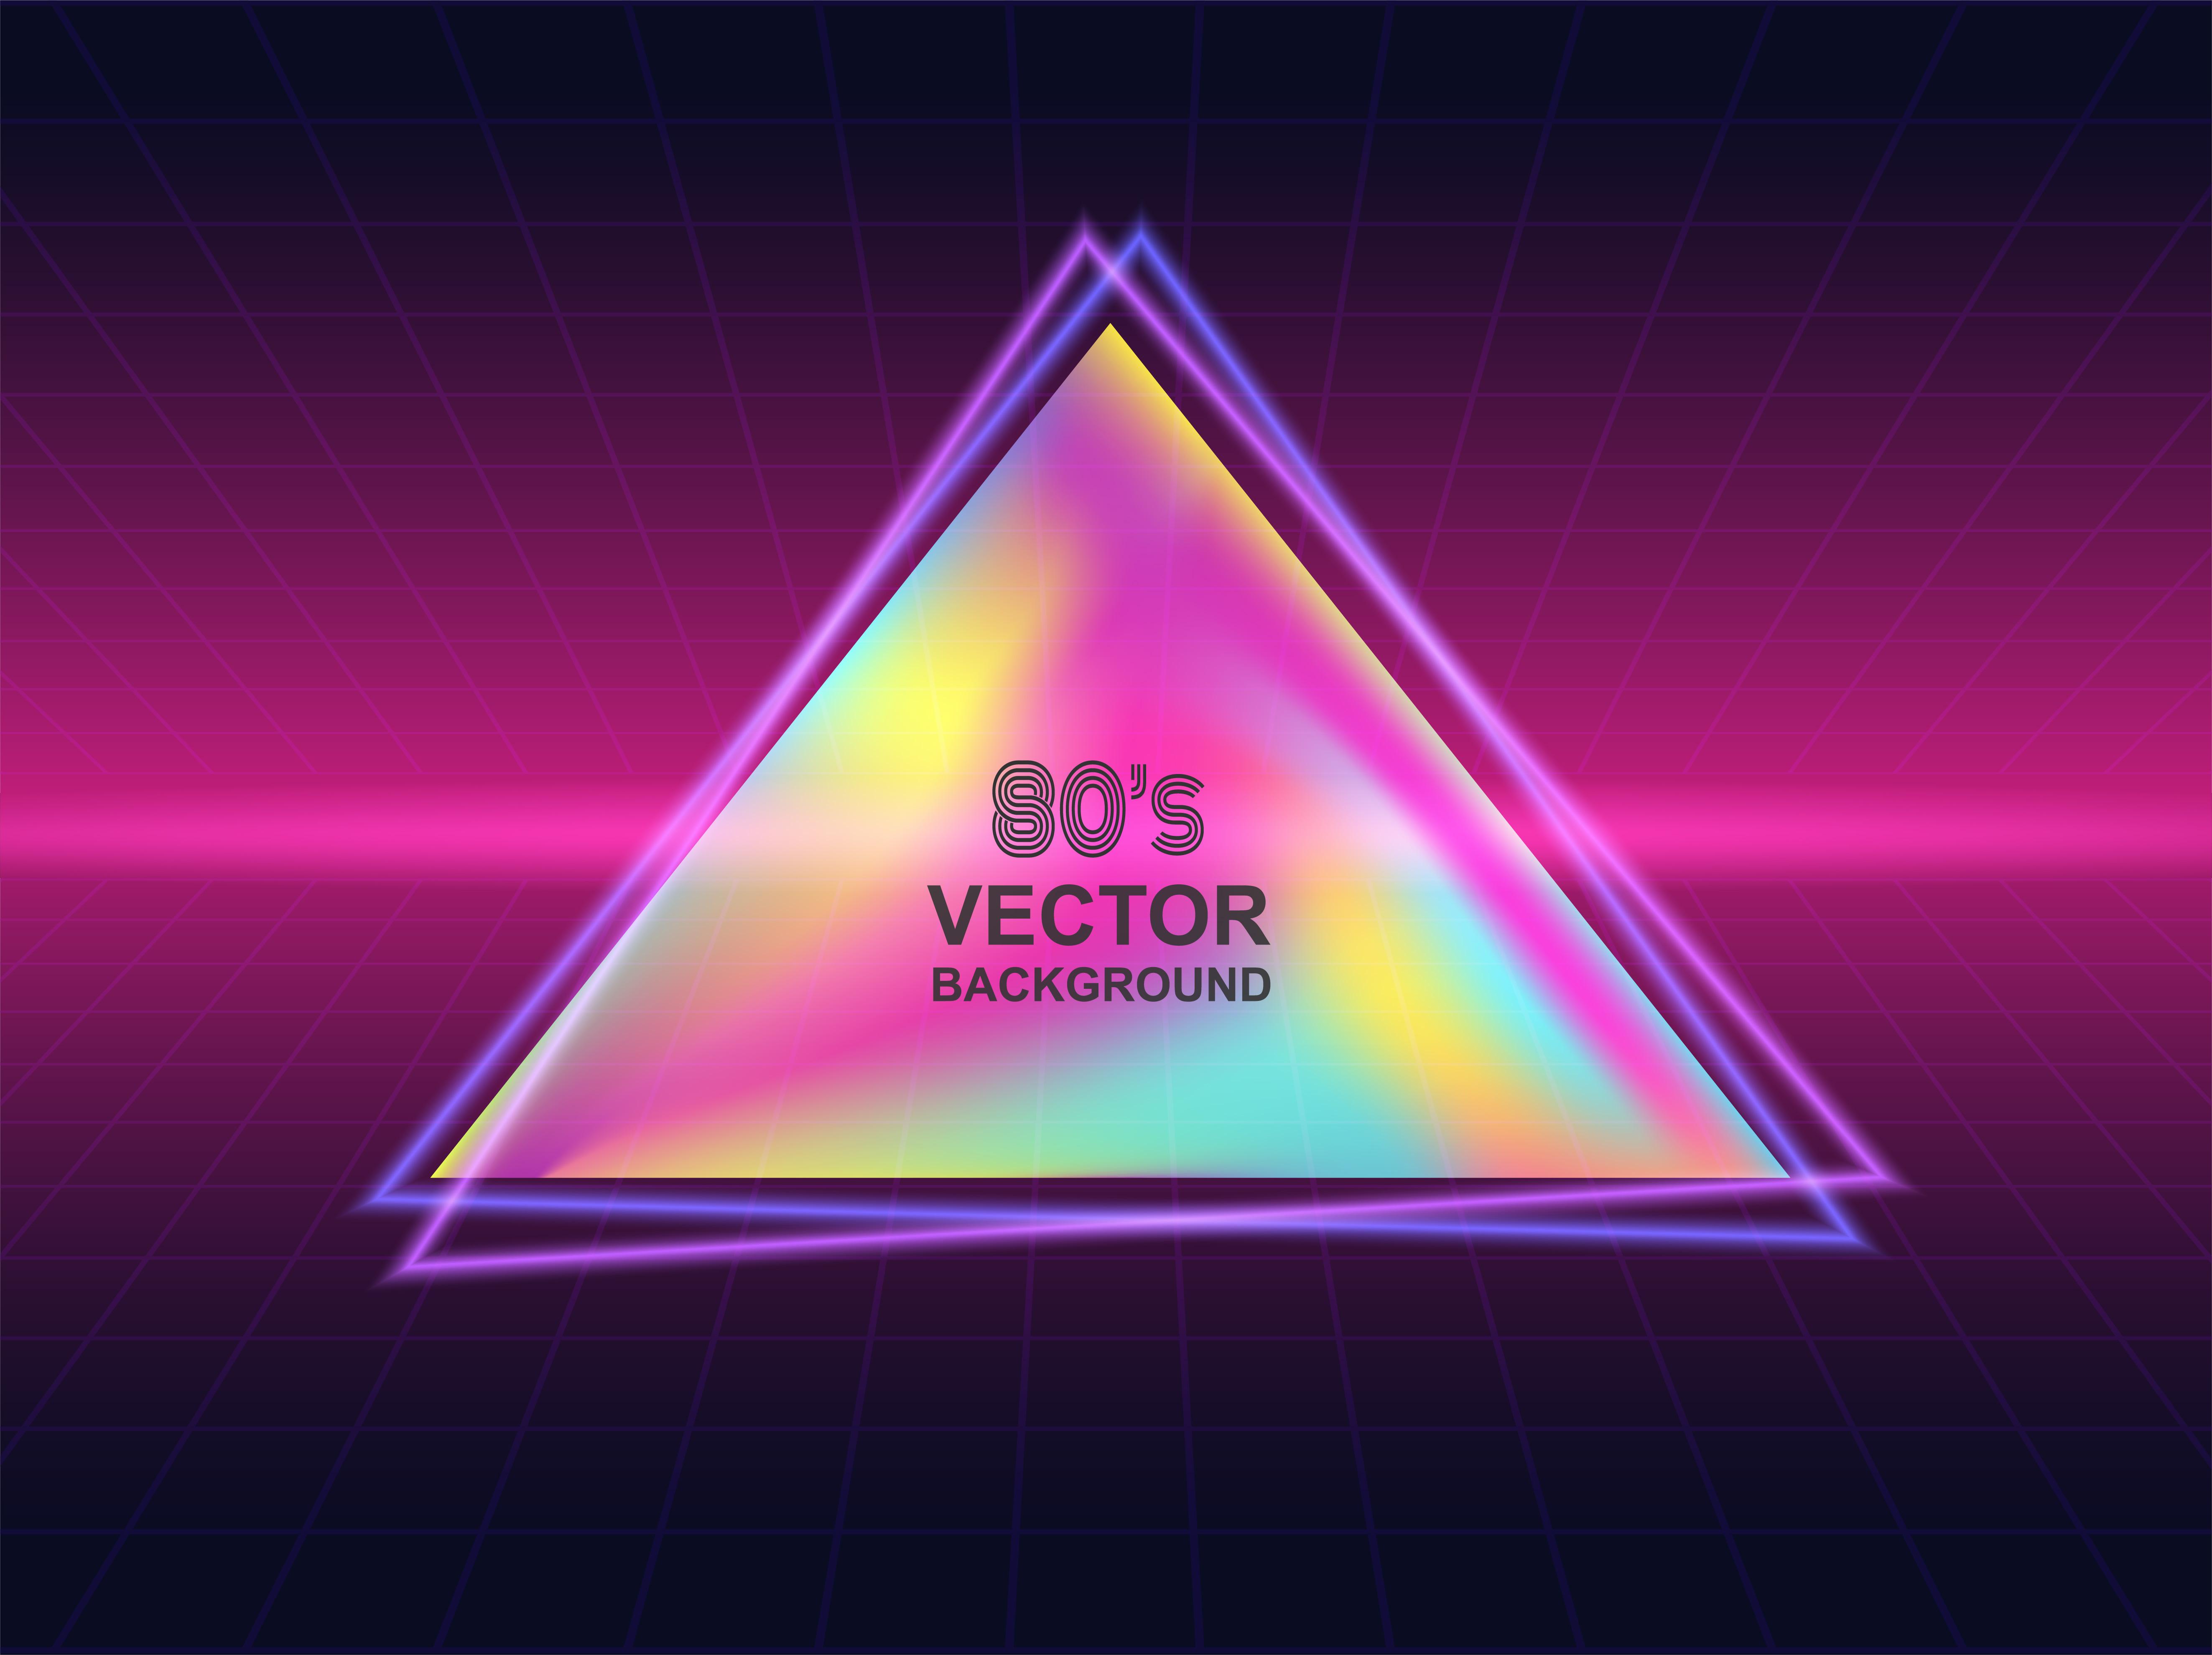 1980s neon triangle design - Download Free Vectors, Clipart Graphics & Vector Art